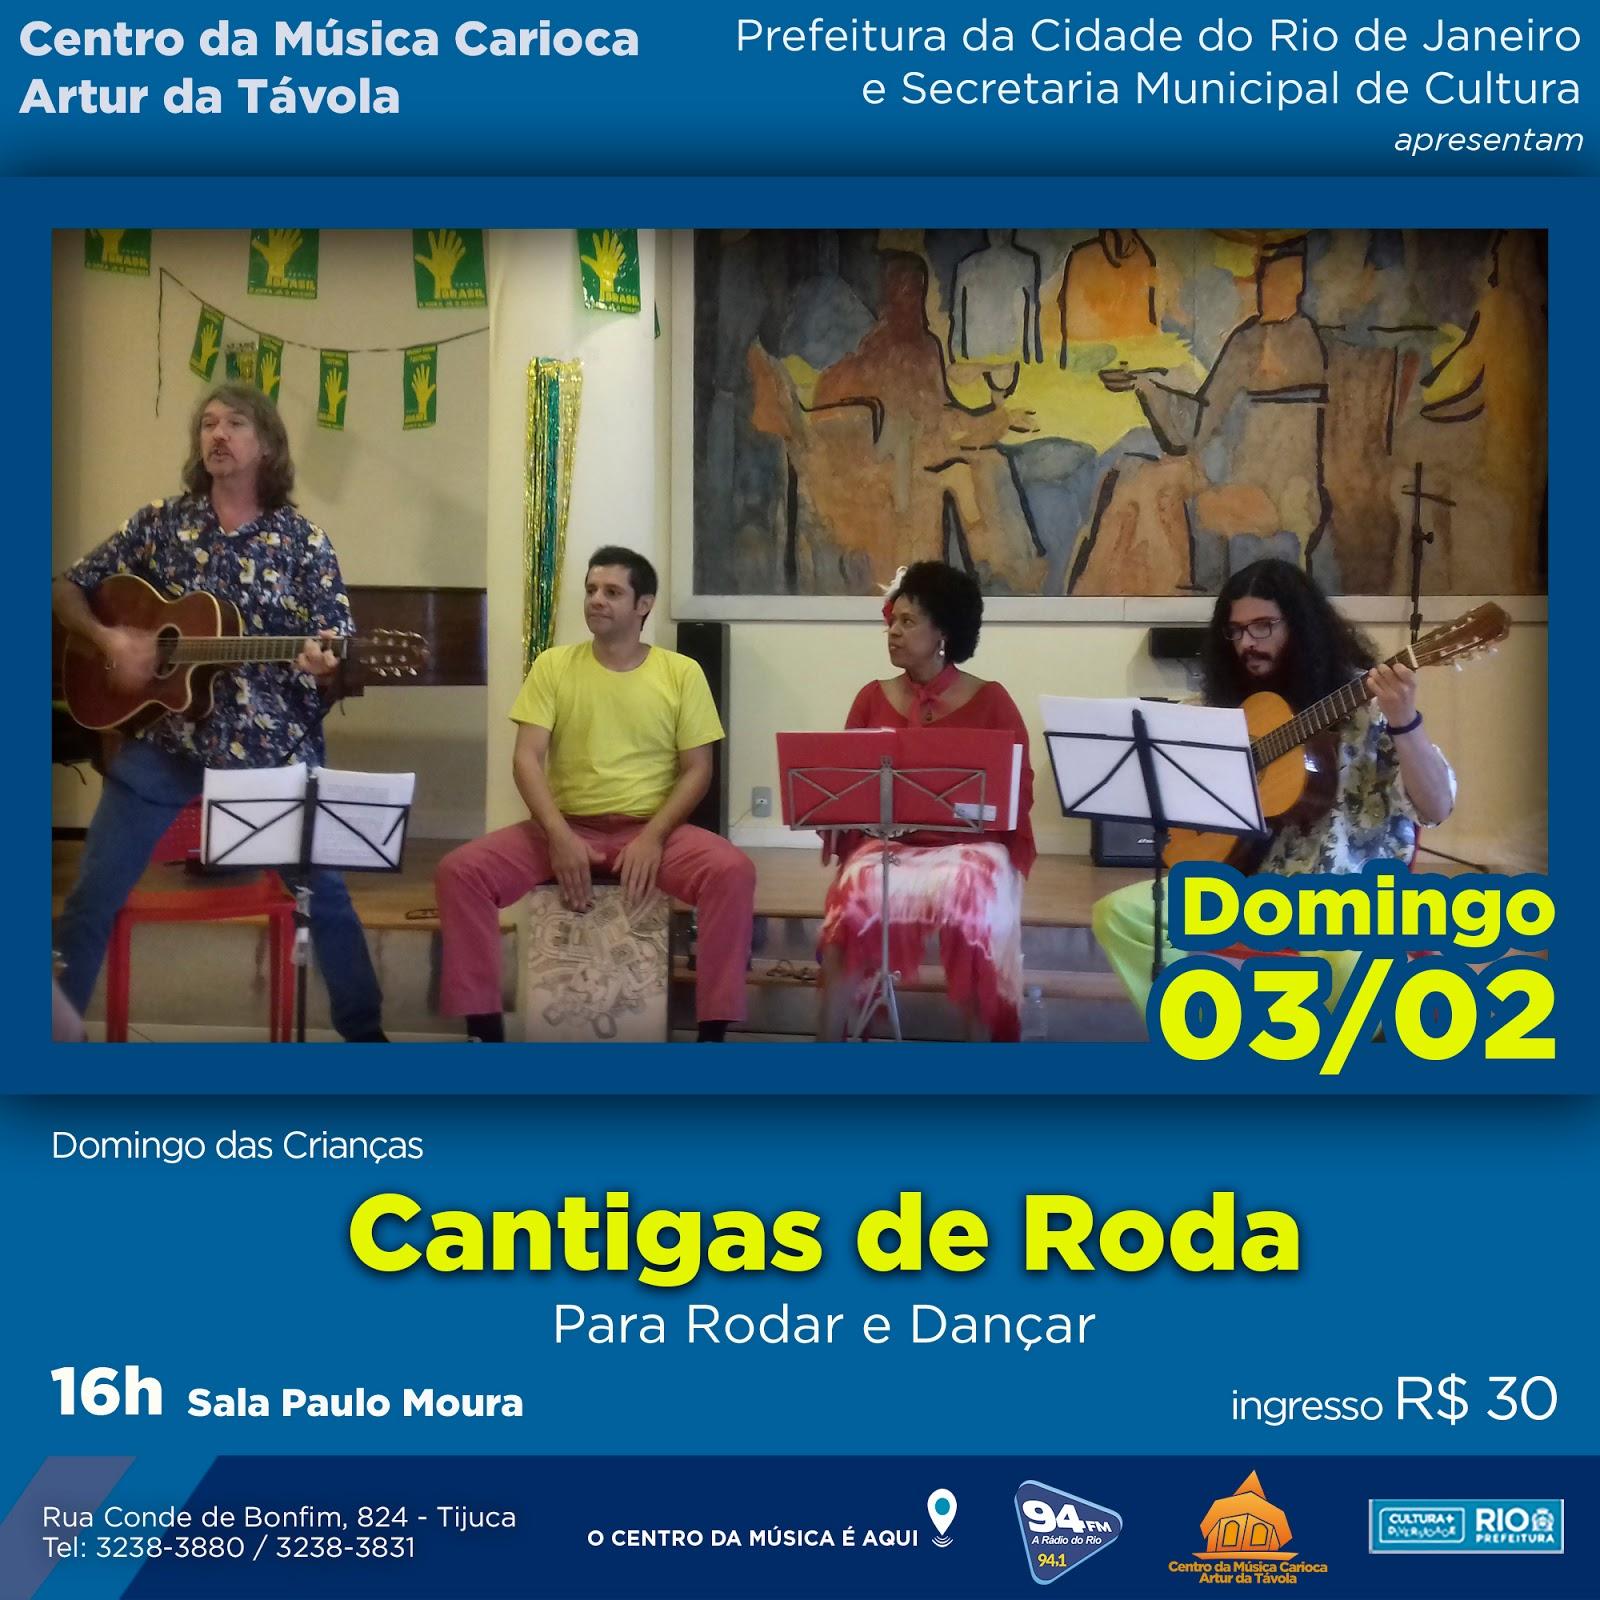 Programa o fevereiro 2019 centro da m sica carioca for Compositore tedesco della musica da tavola